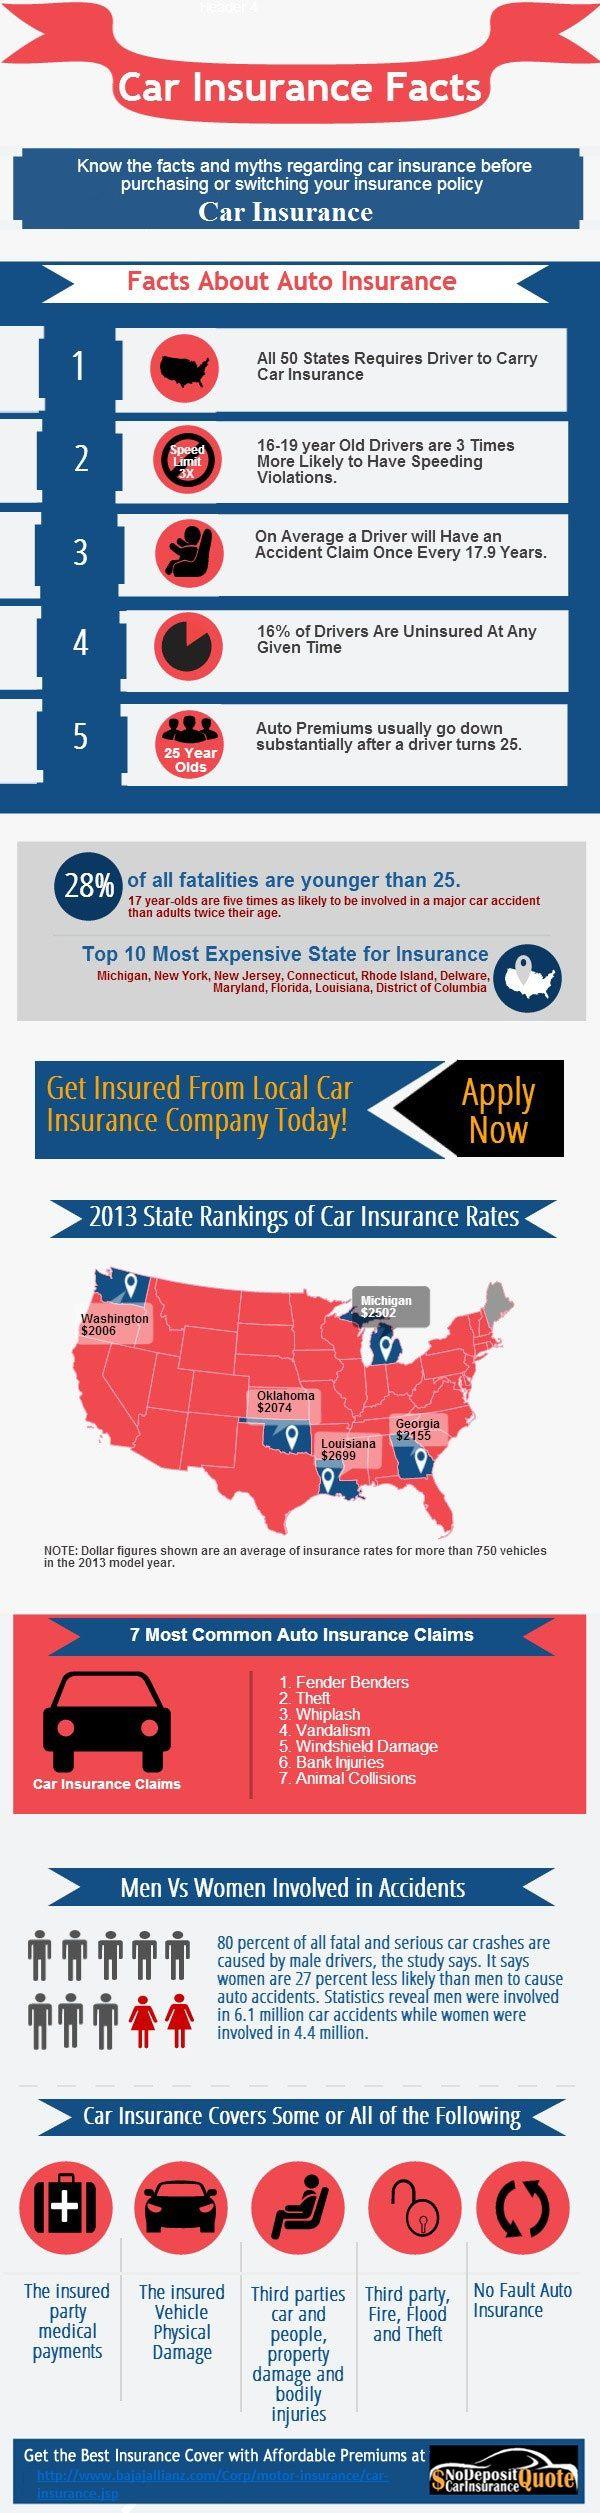 Buy or renew car insurance policies online. Buy car insurance policy in easy steps. Get 24x7 spot assistance cover Car Insurance policy. Visit more information: http://www.bajajallianz.com/Corp/motor-insurance/car-insurance.jsp